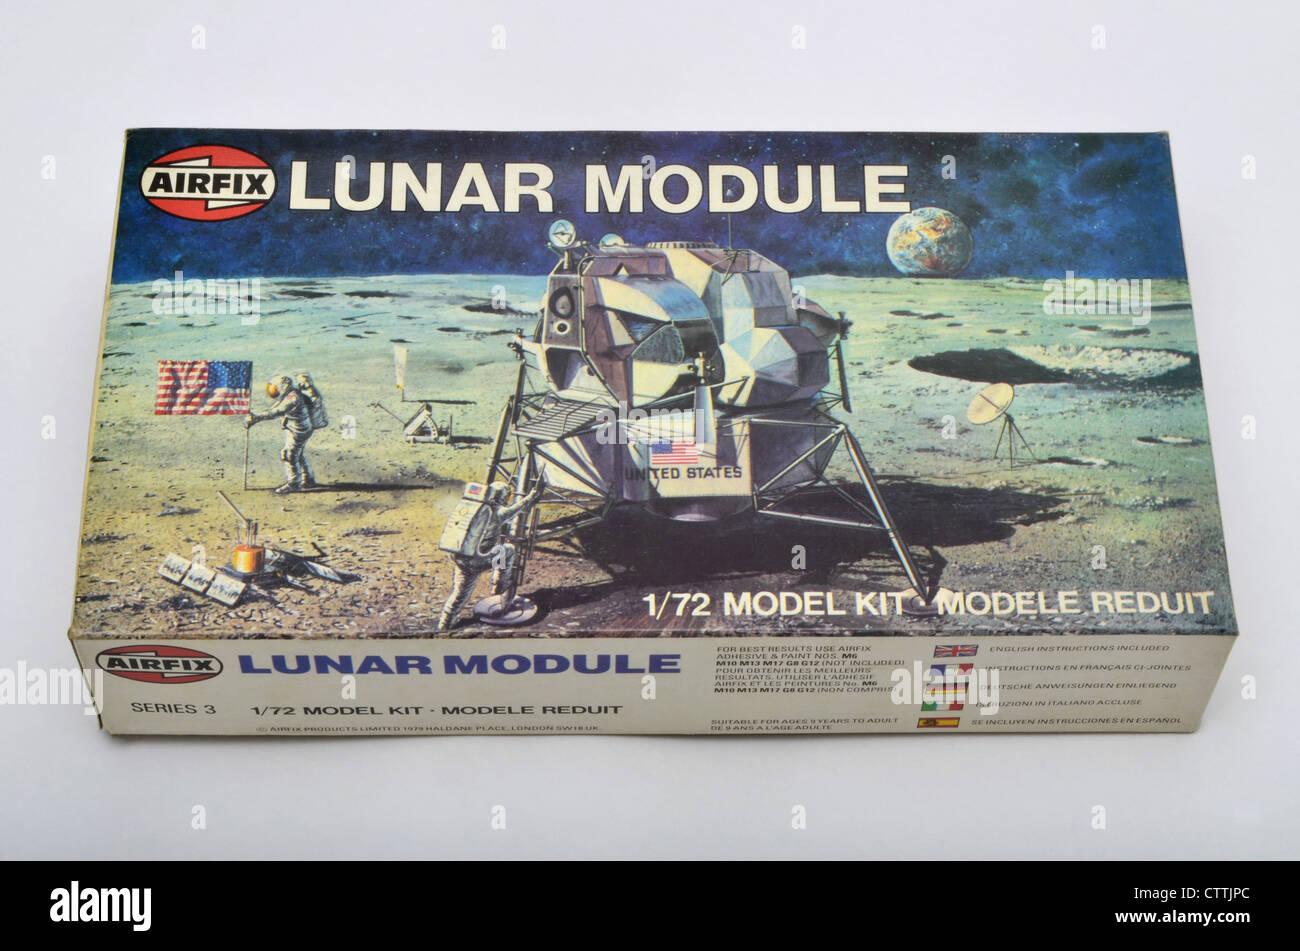 Airfix 1/72 scale Lunar Module construction kit box against a white background - Stock Image